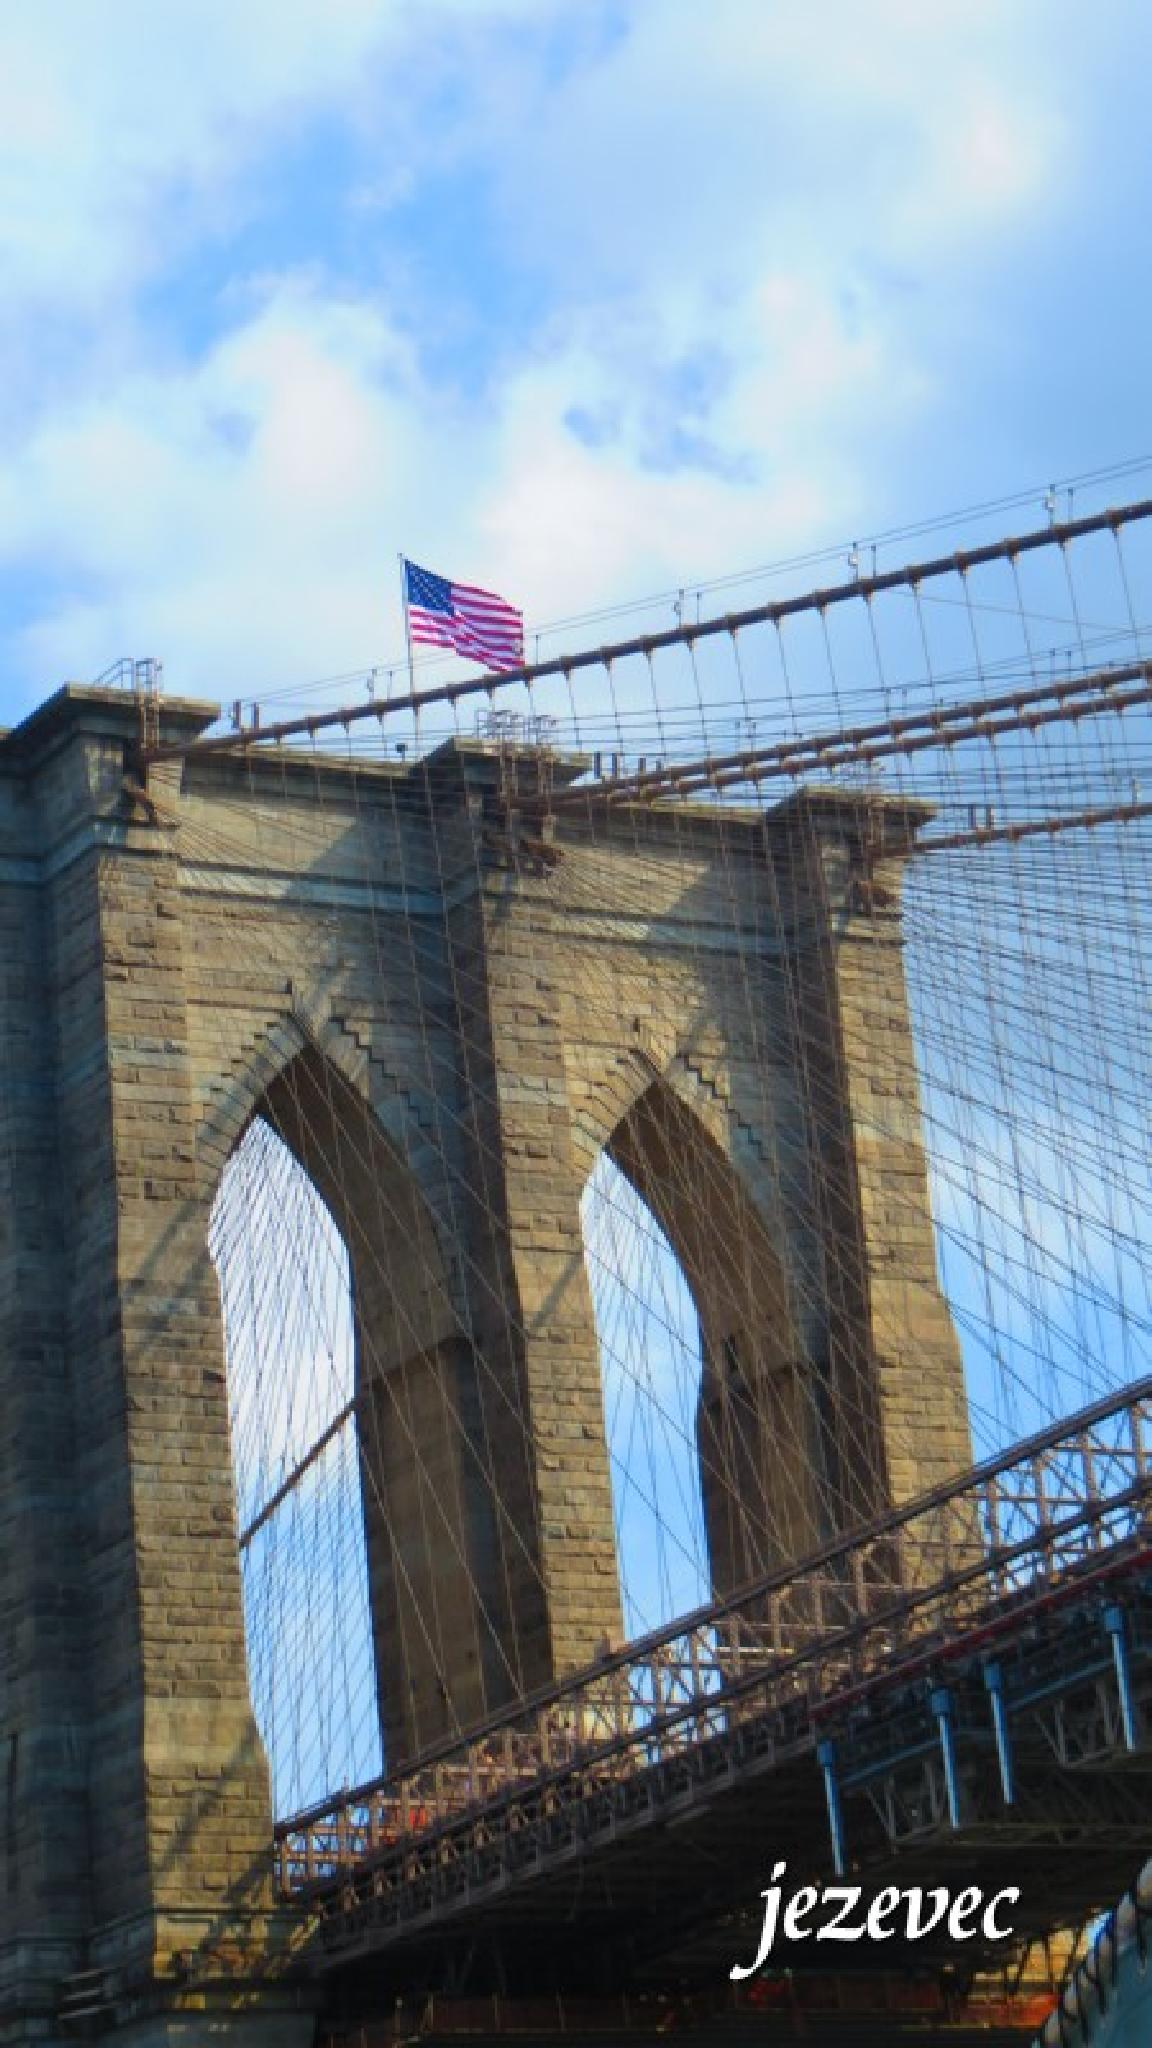 Brooklyn Bridge 2014-07-20 0737 by jezevec40